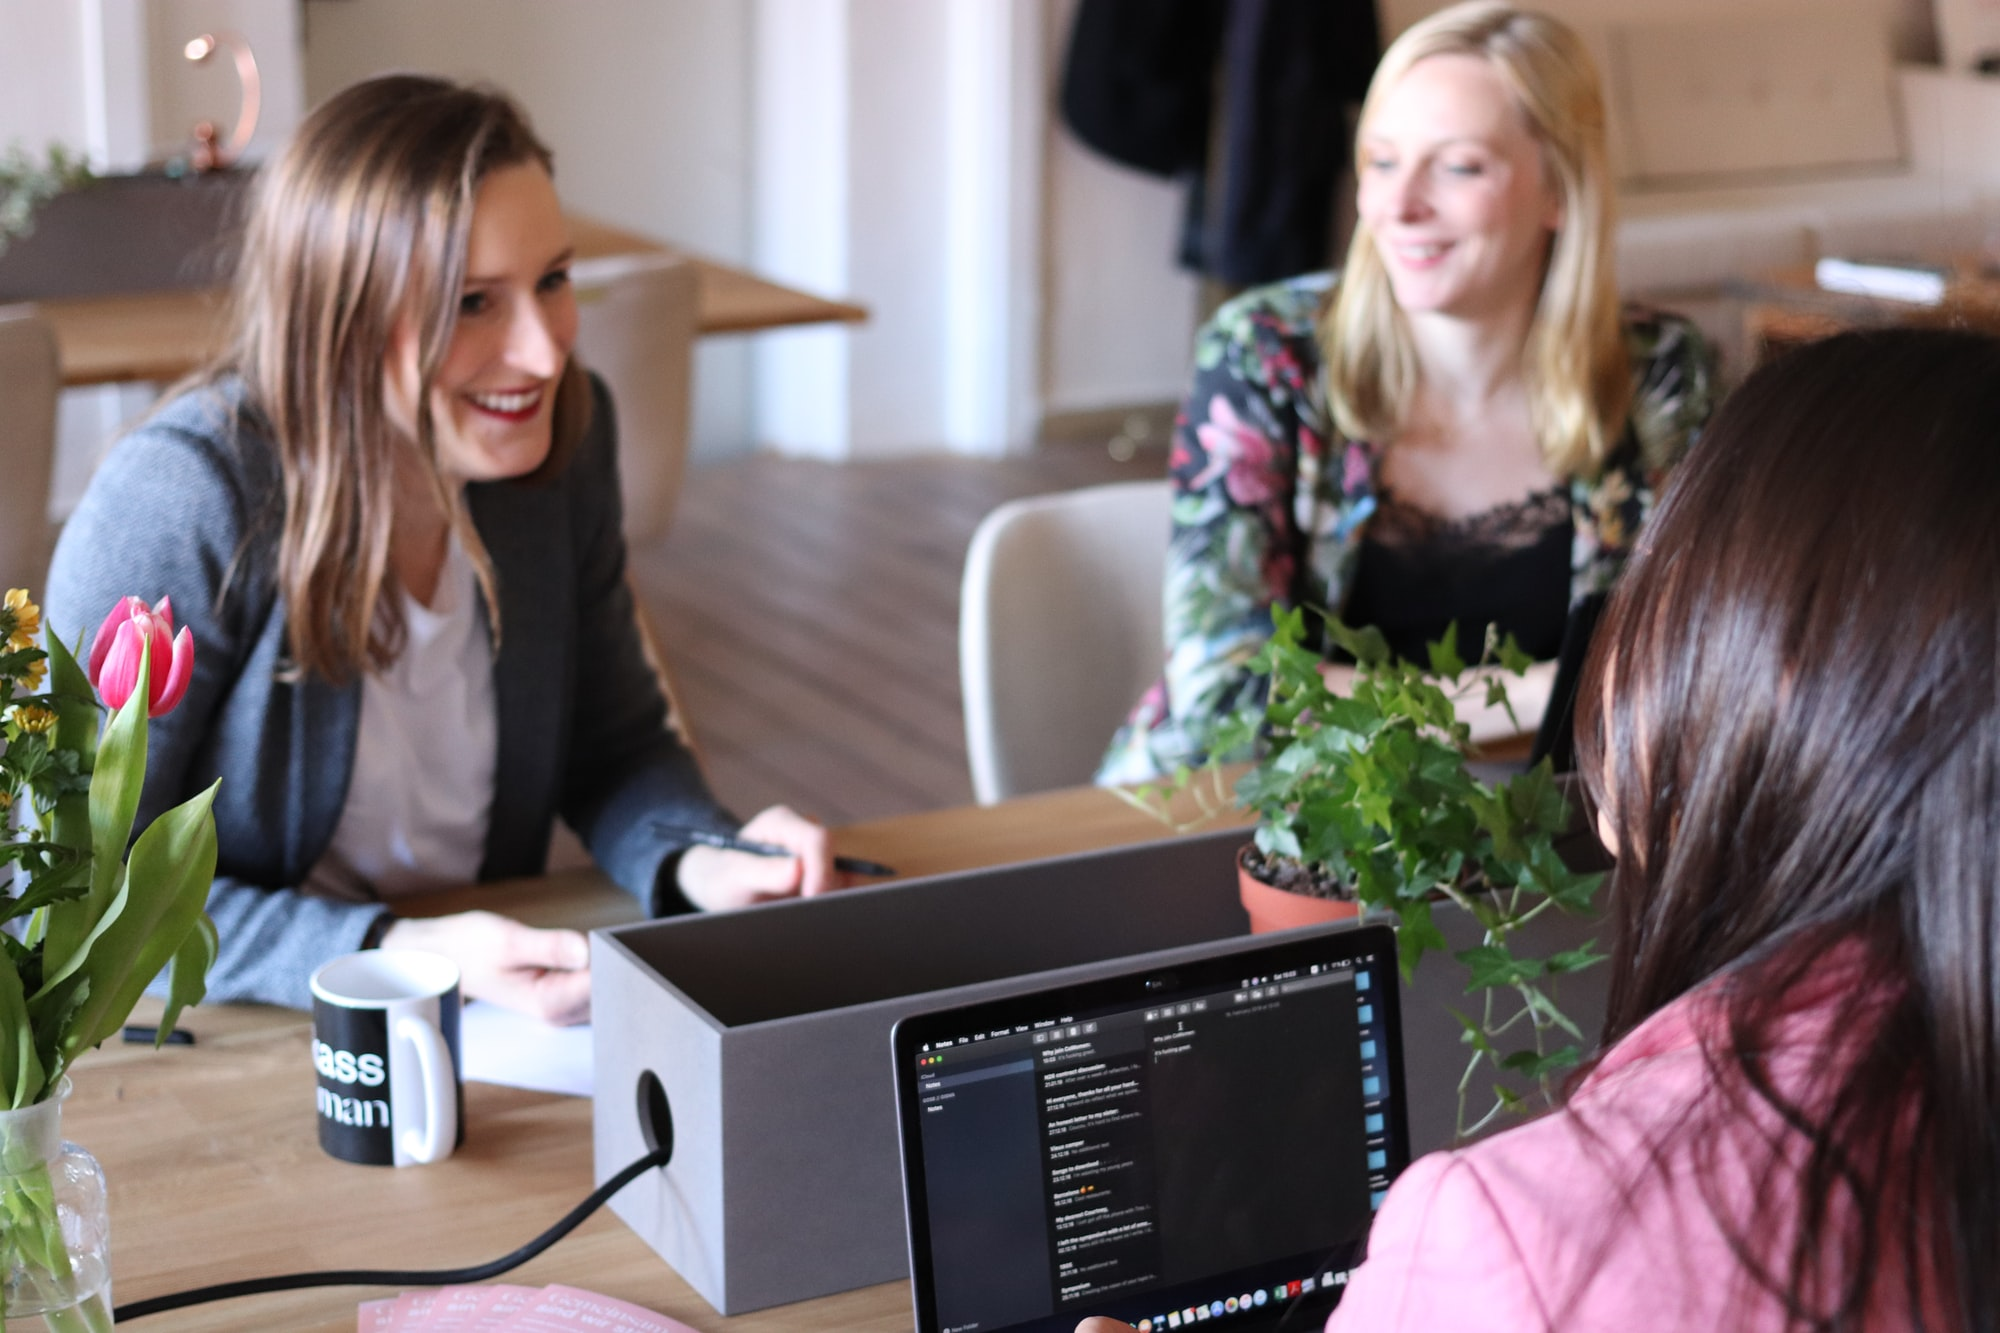 Gender Balance Strategies for 21st Century Organizations